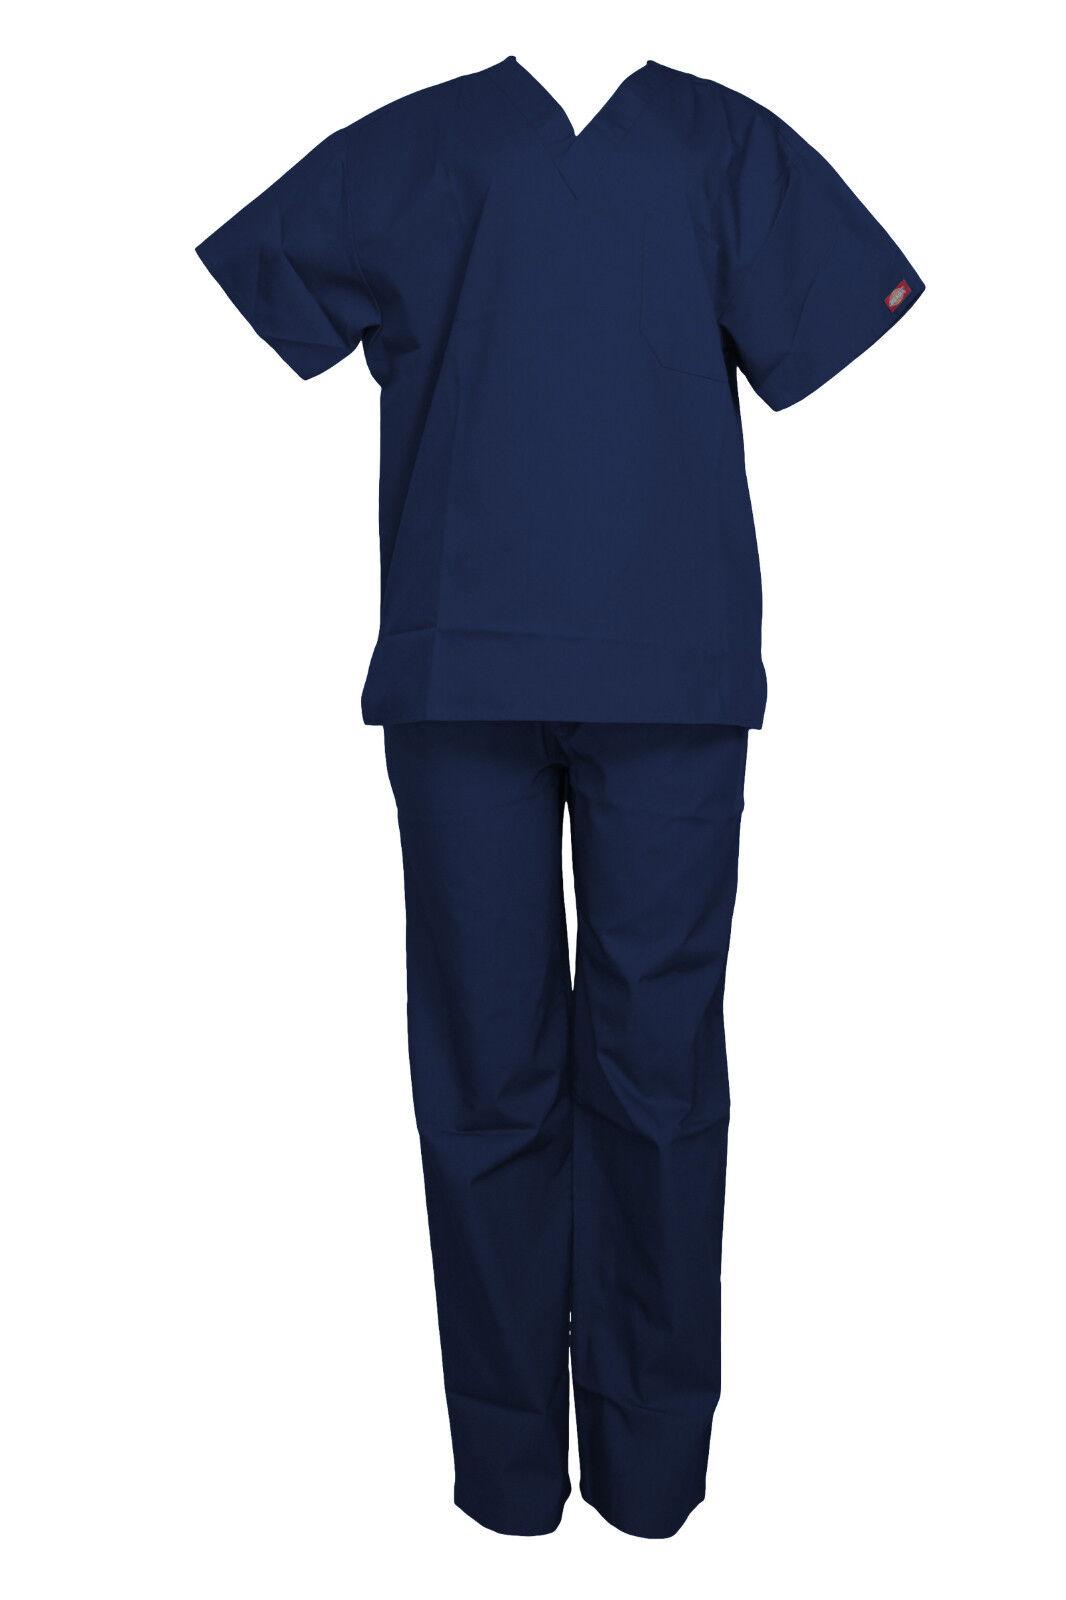 Dickies Unisex Blu Scuro Scrub Set Medico Coulisse Maglia Scollo a V Coulisse Medico b4f4d8